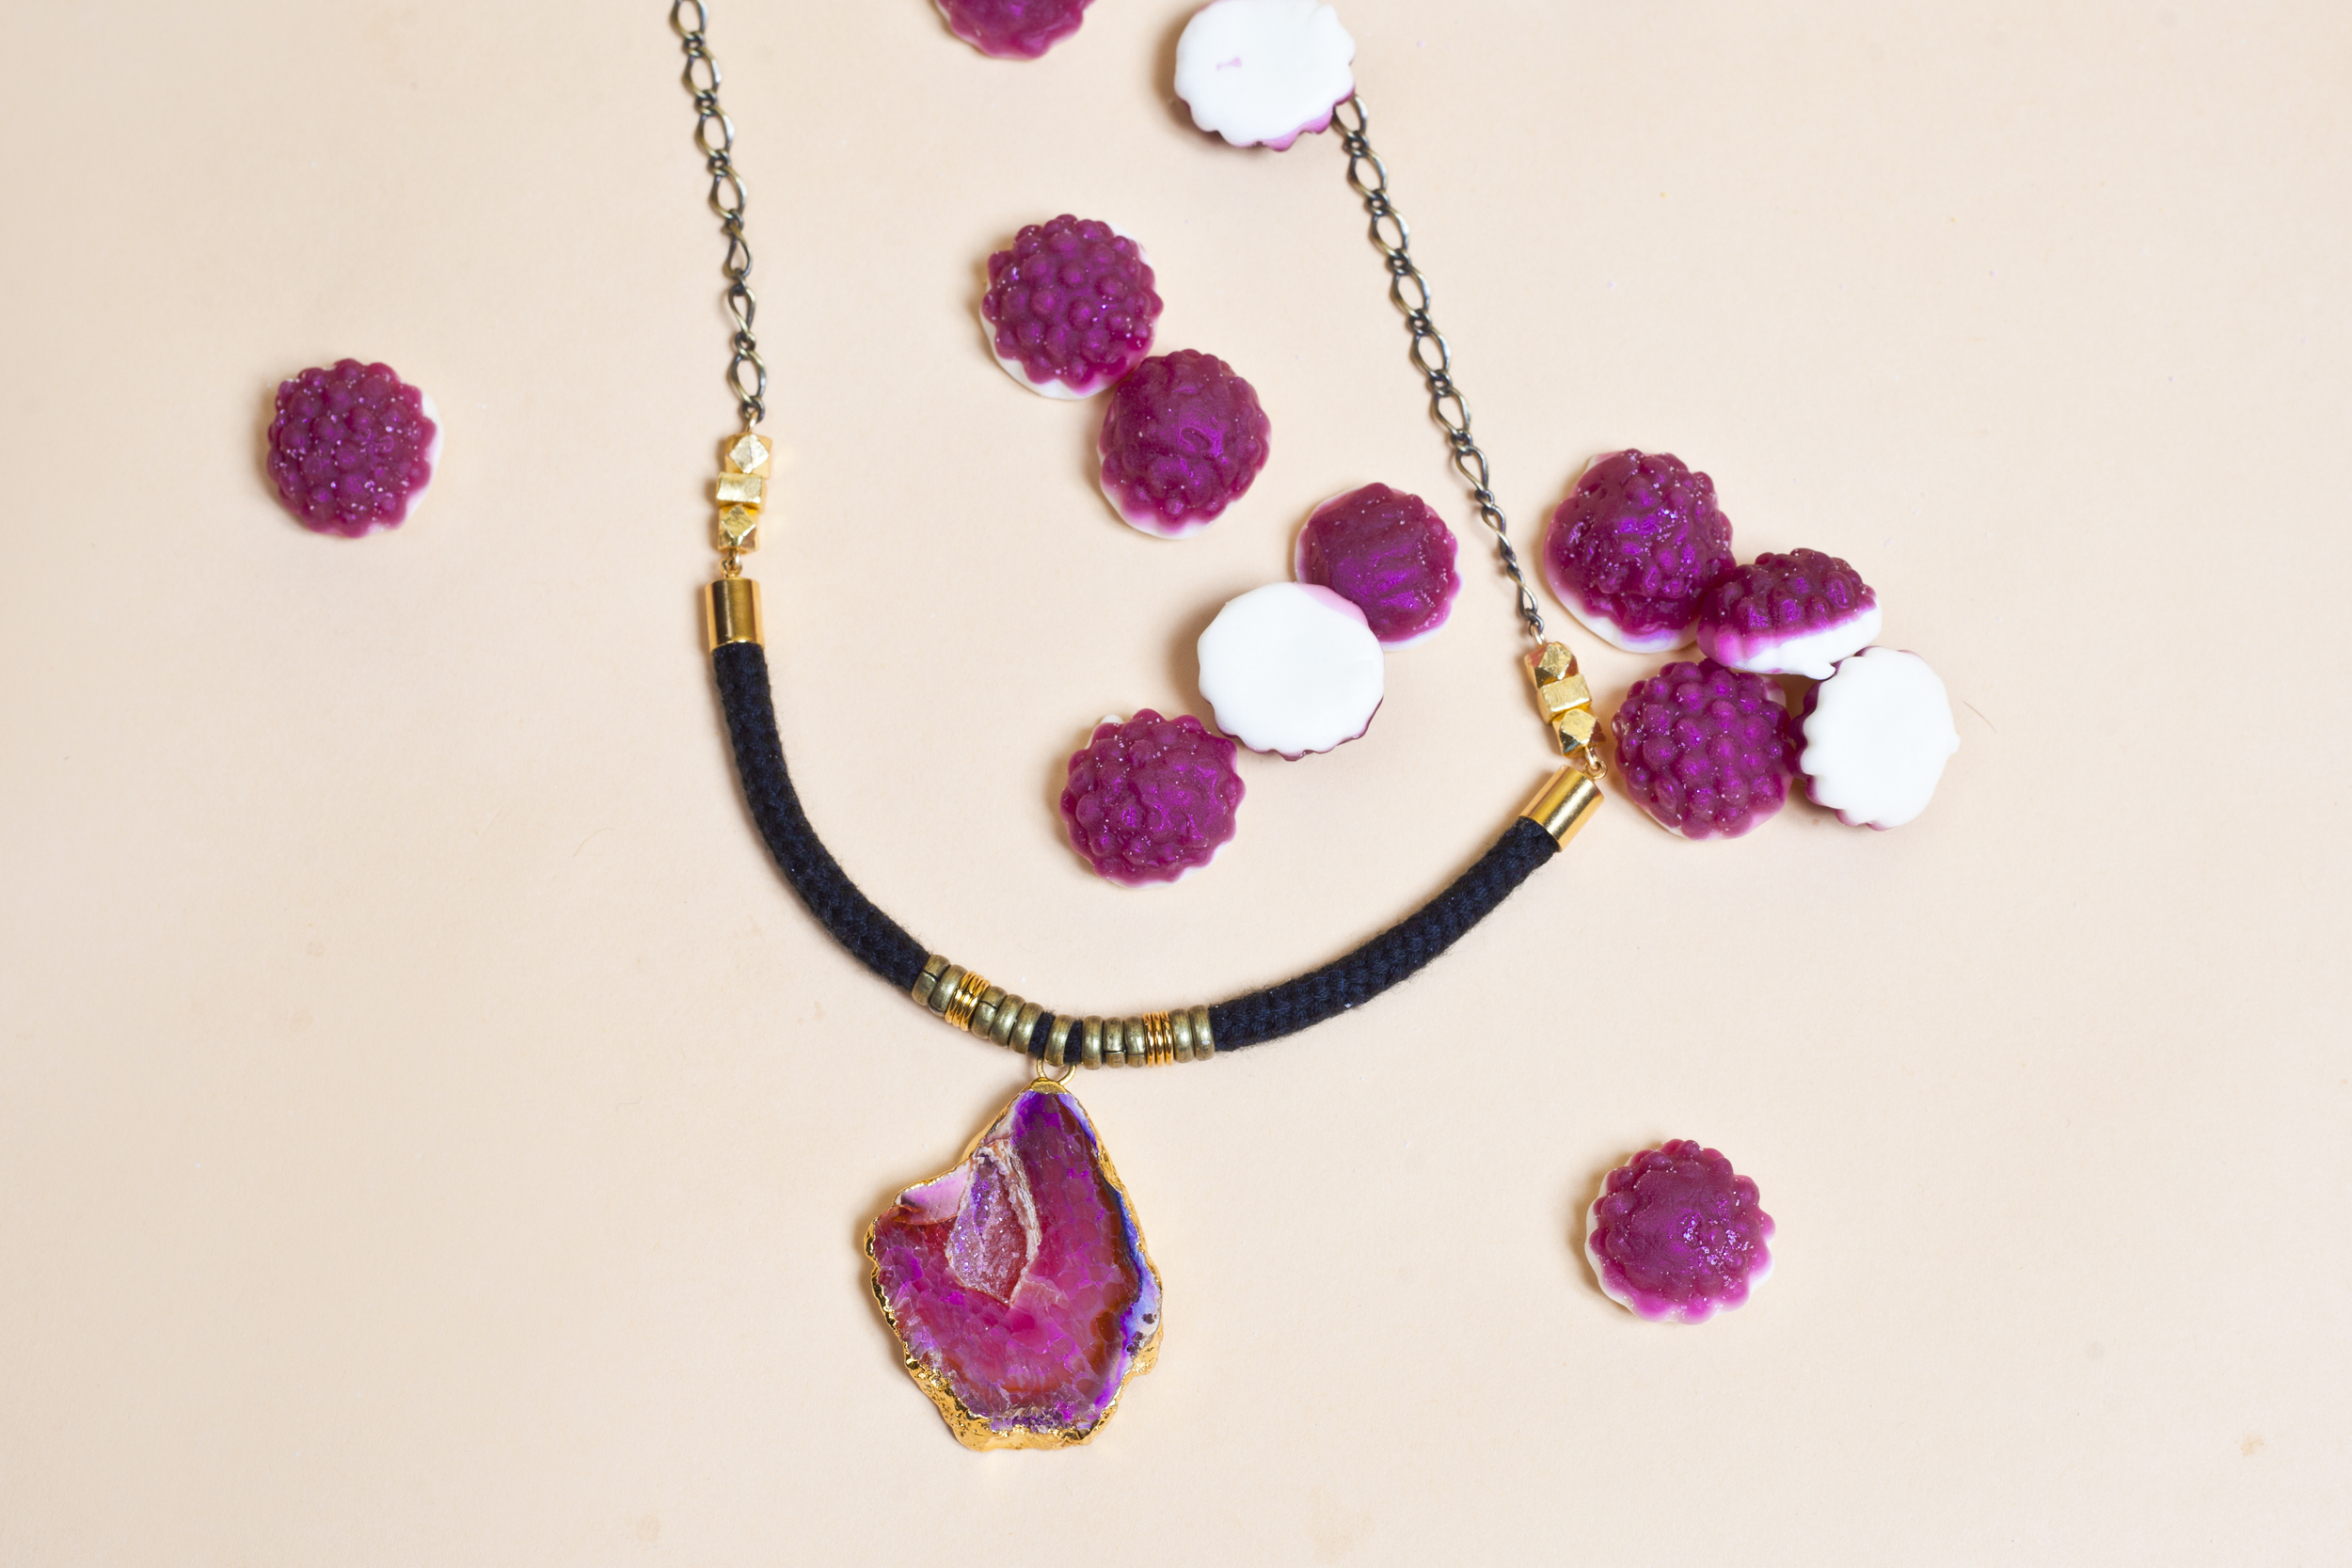 CapMag-Jewelry-Feb14-AChurch-97.jpg